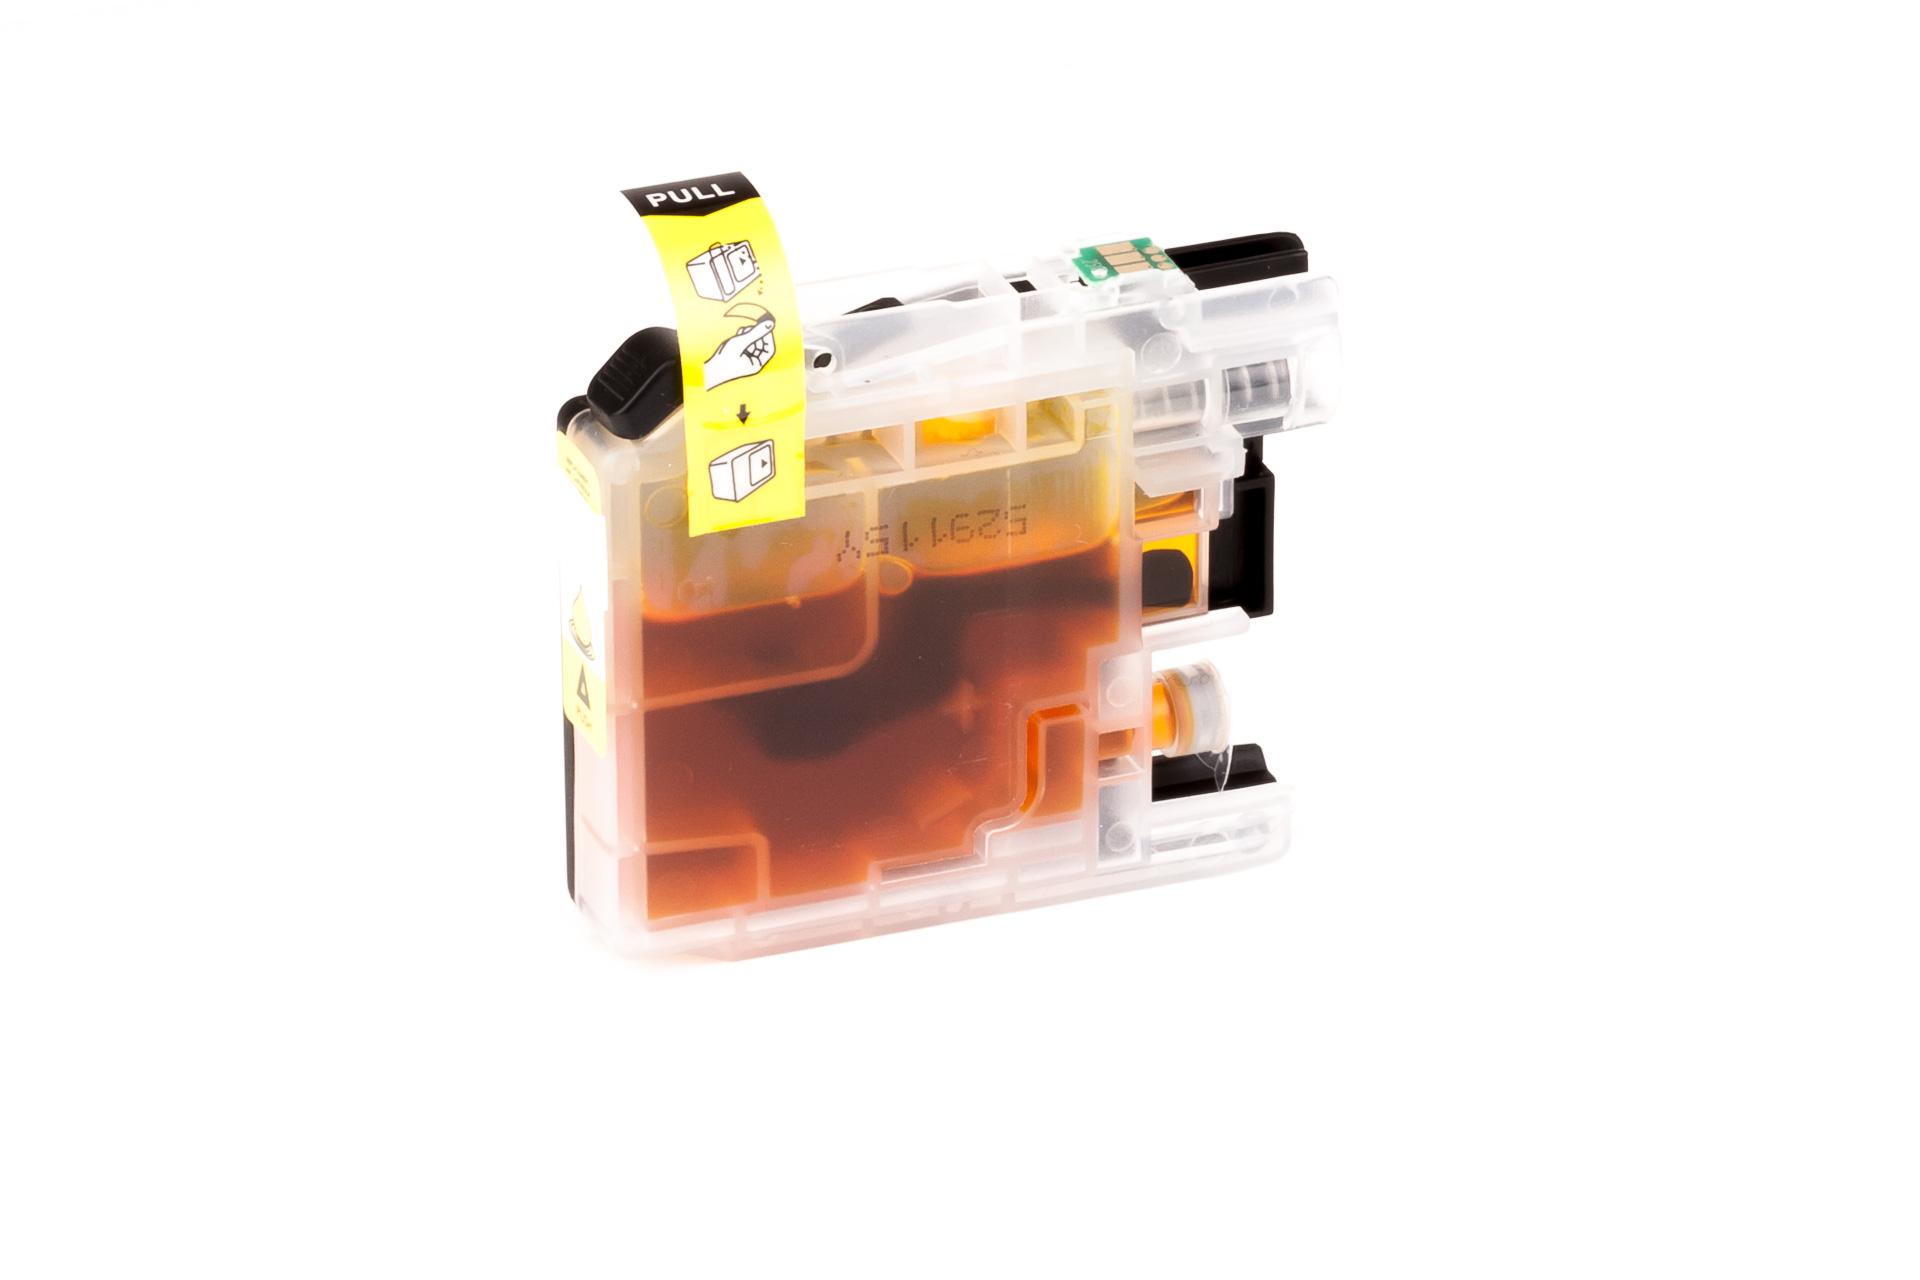 ASC-Premium-Tintenpatrone für Brother MFC-J 4410 DW magenta MFC-J 4410 DW MFC-J4410DW